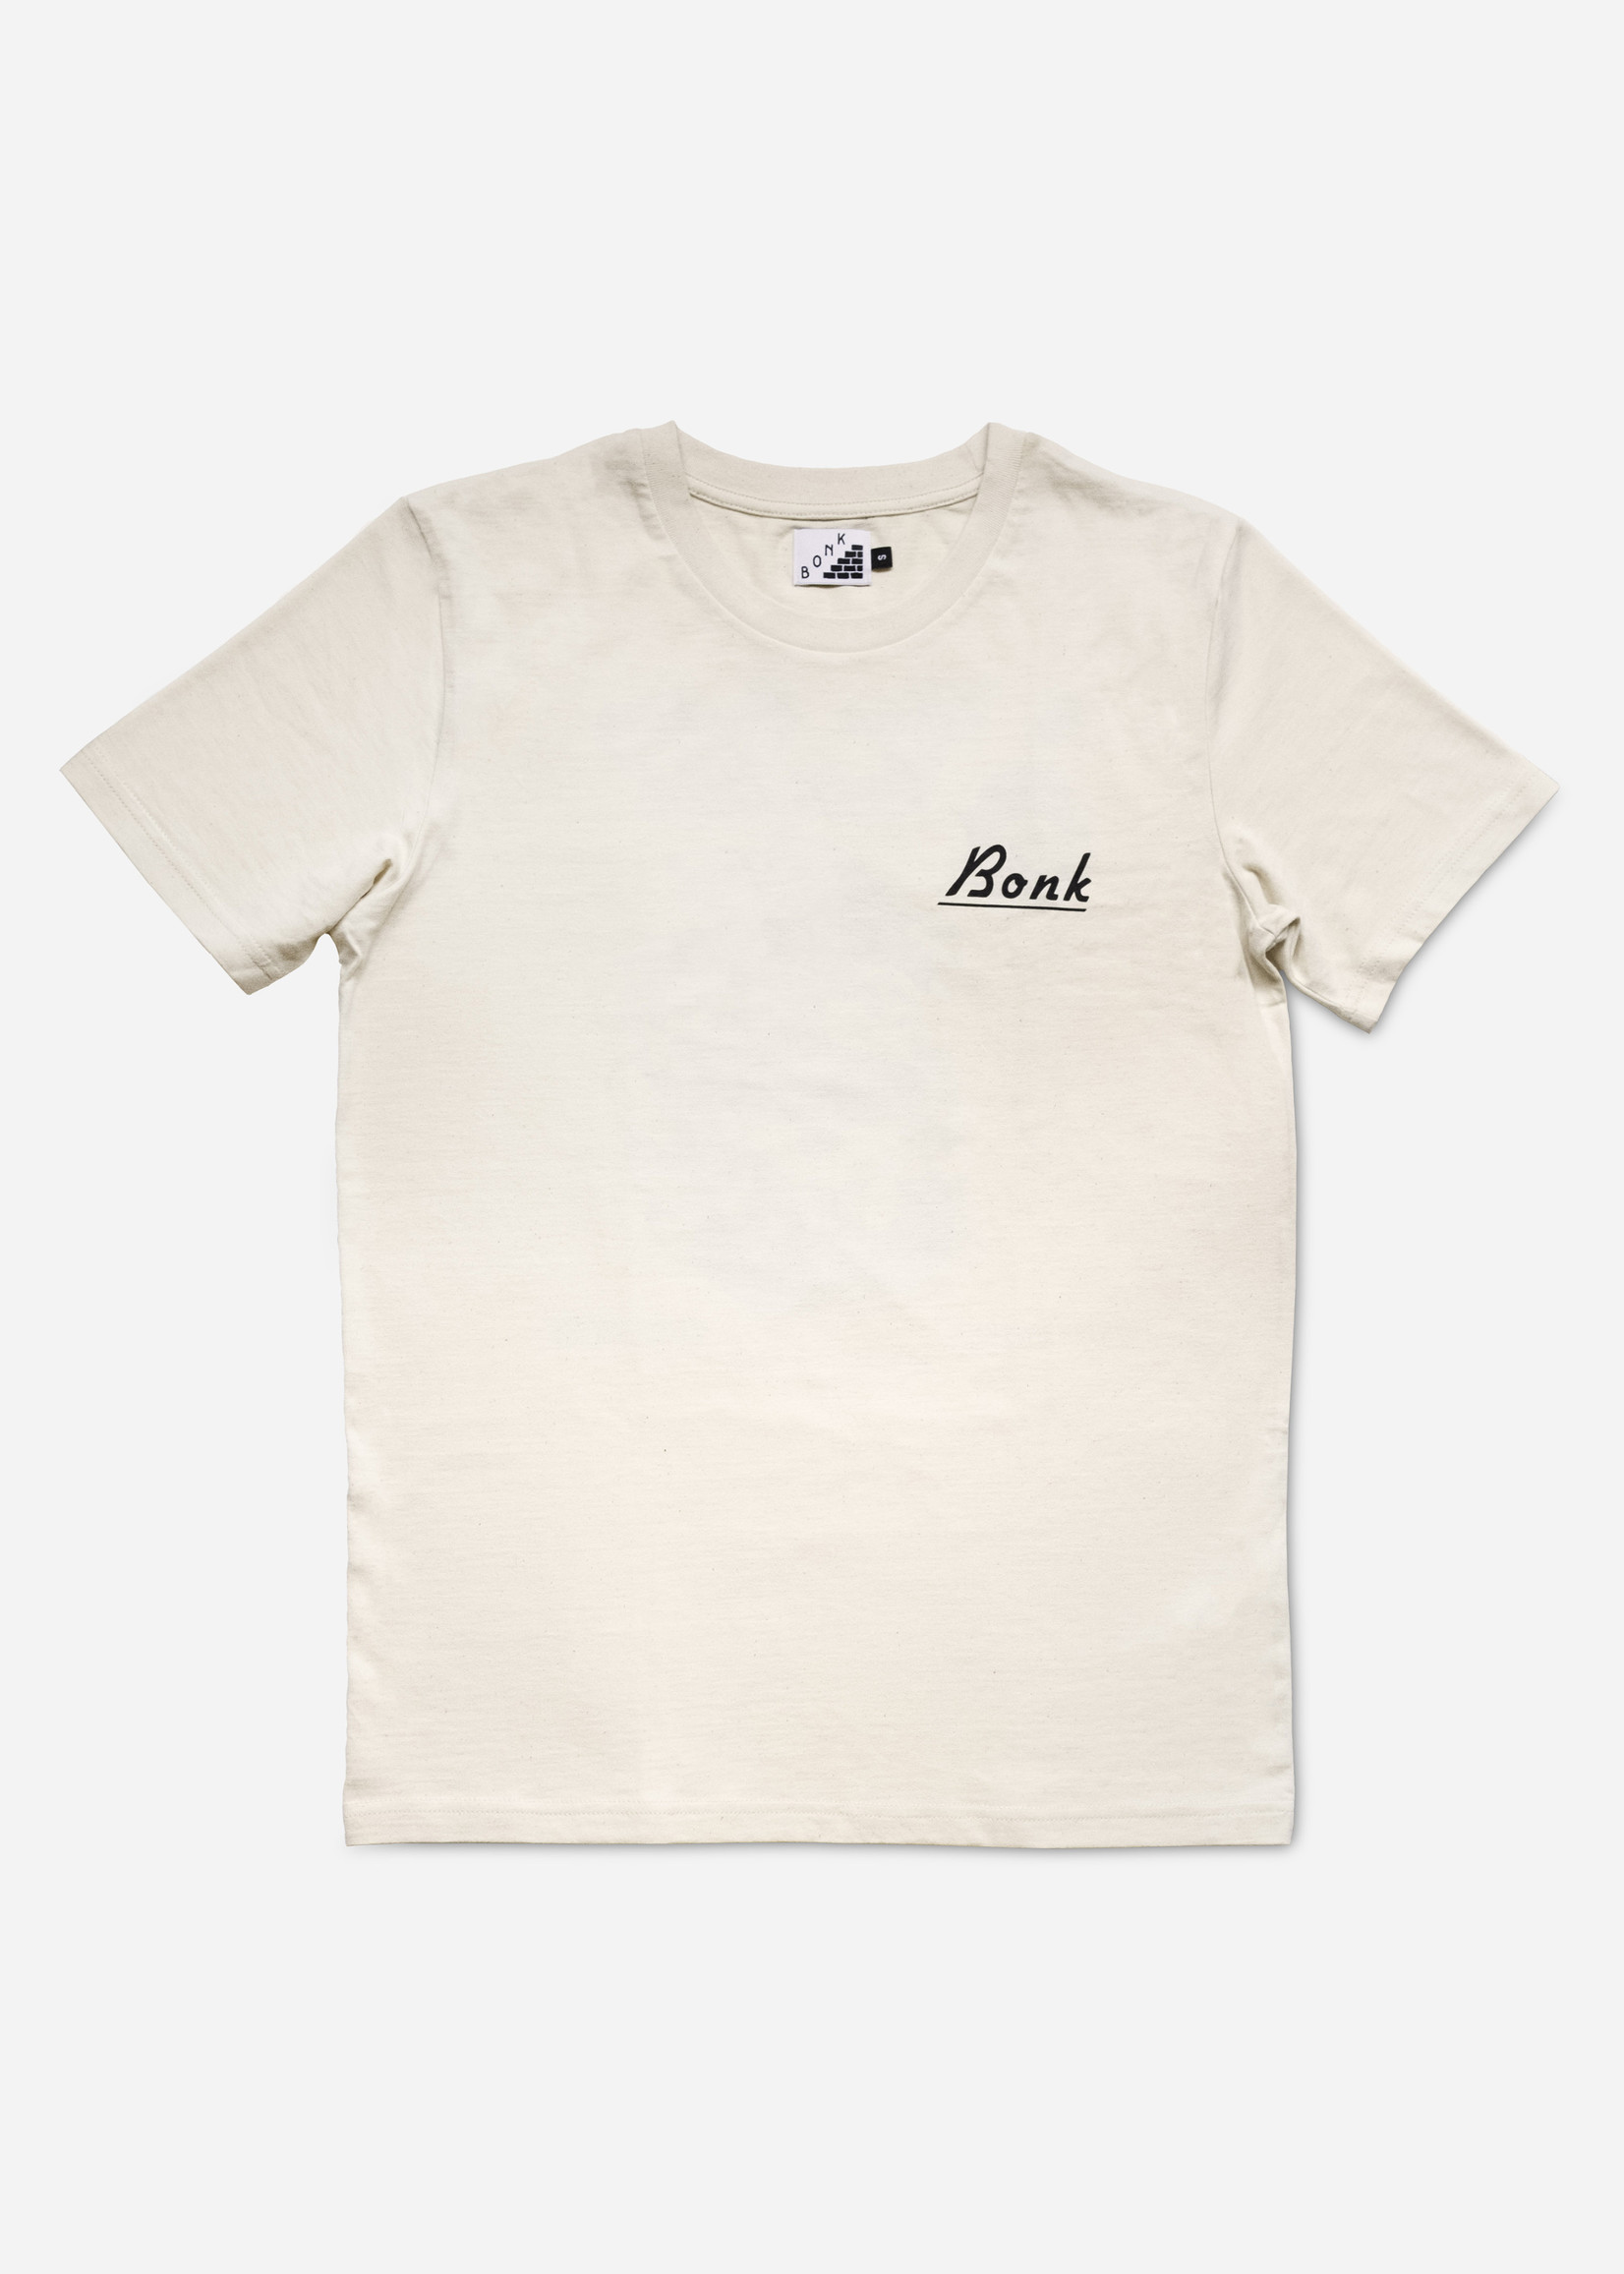 Bonk T-Shirt - After Ride Beer